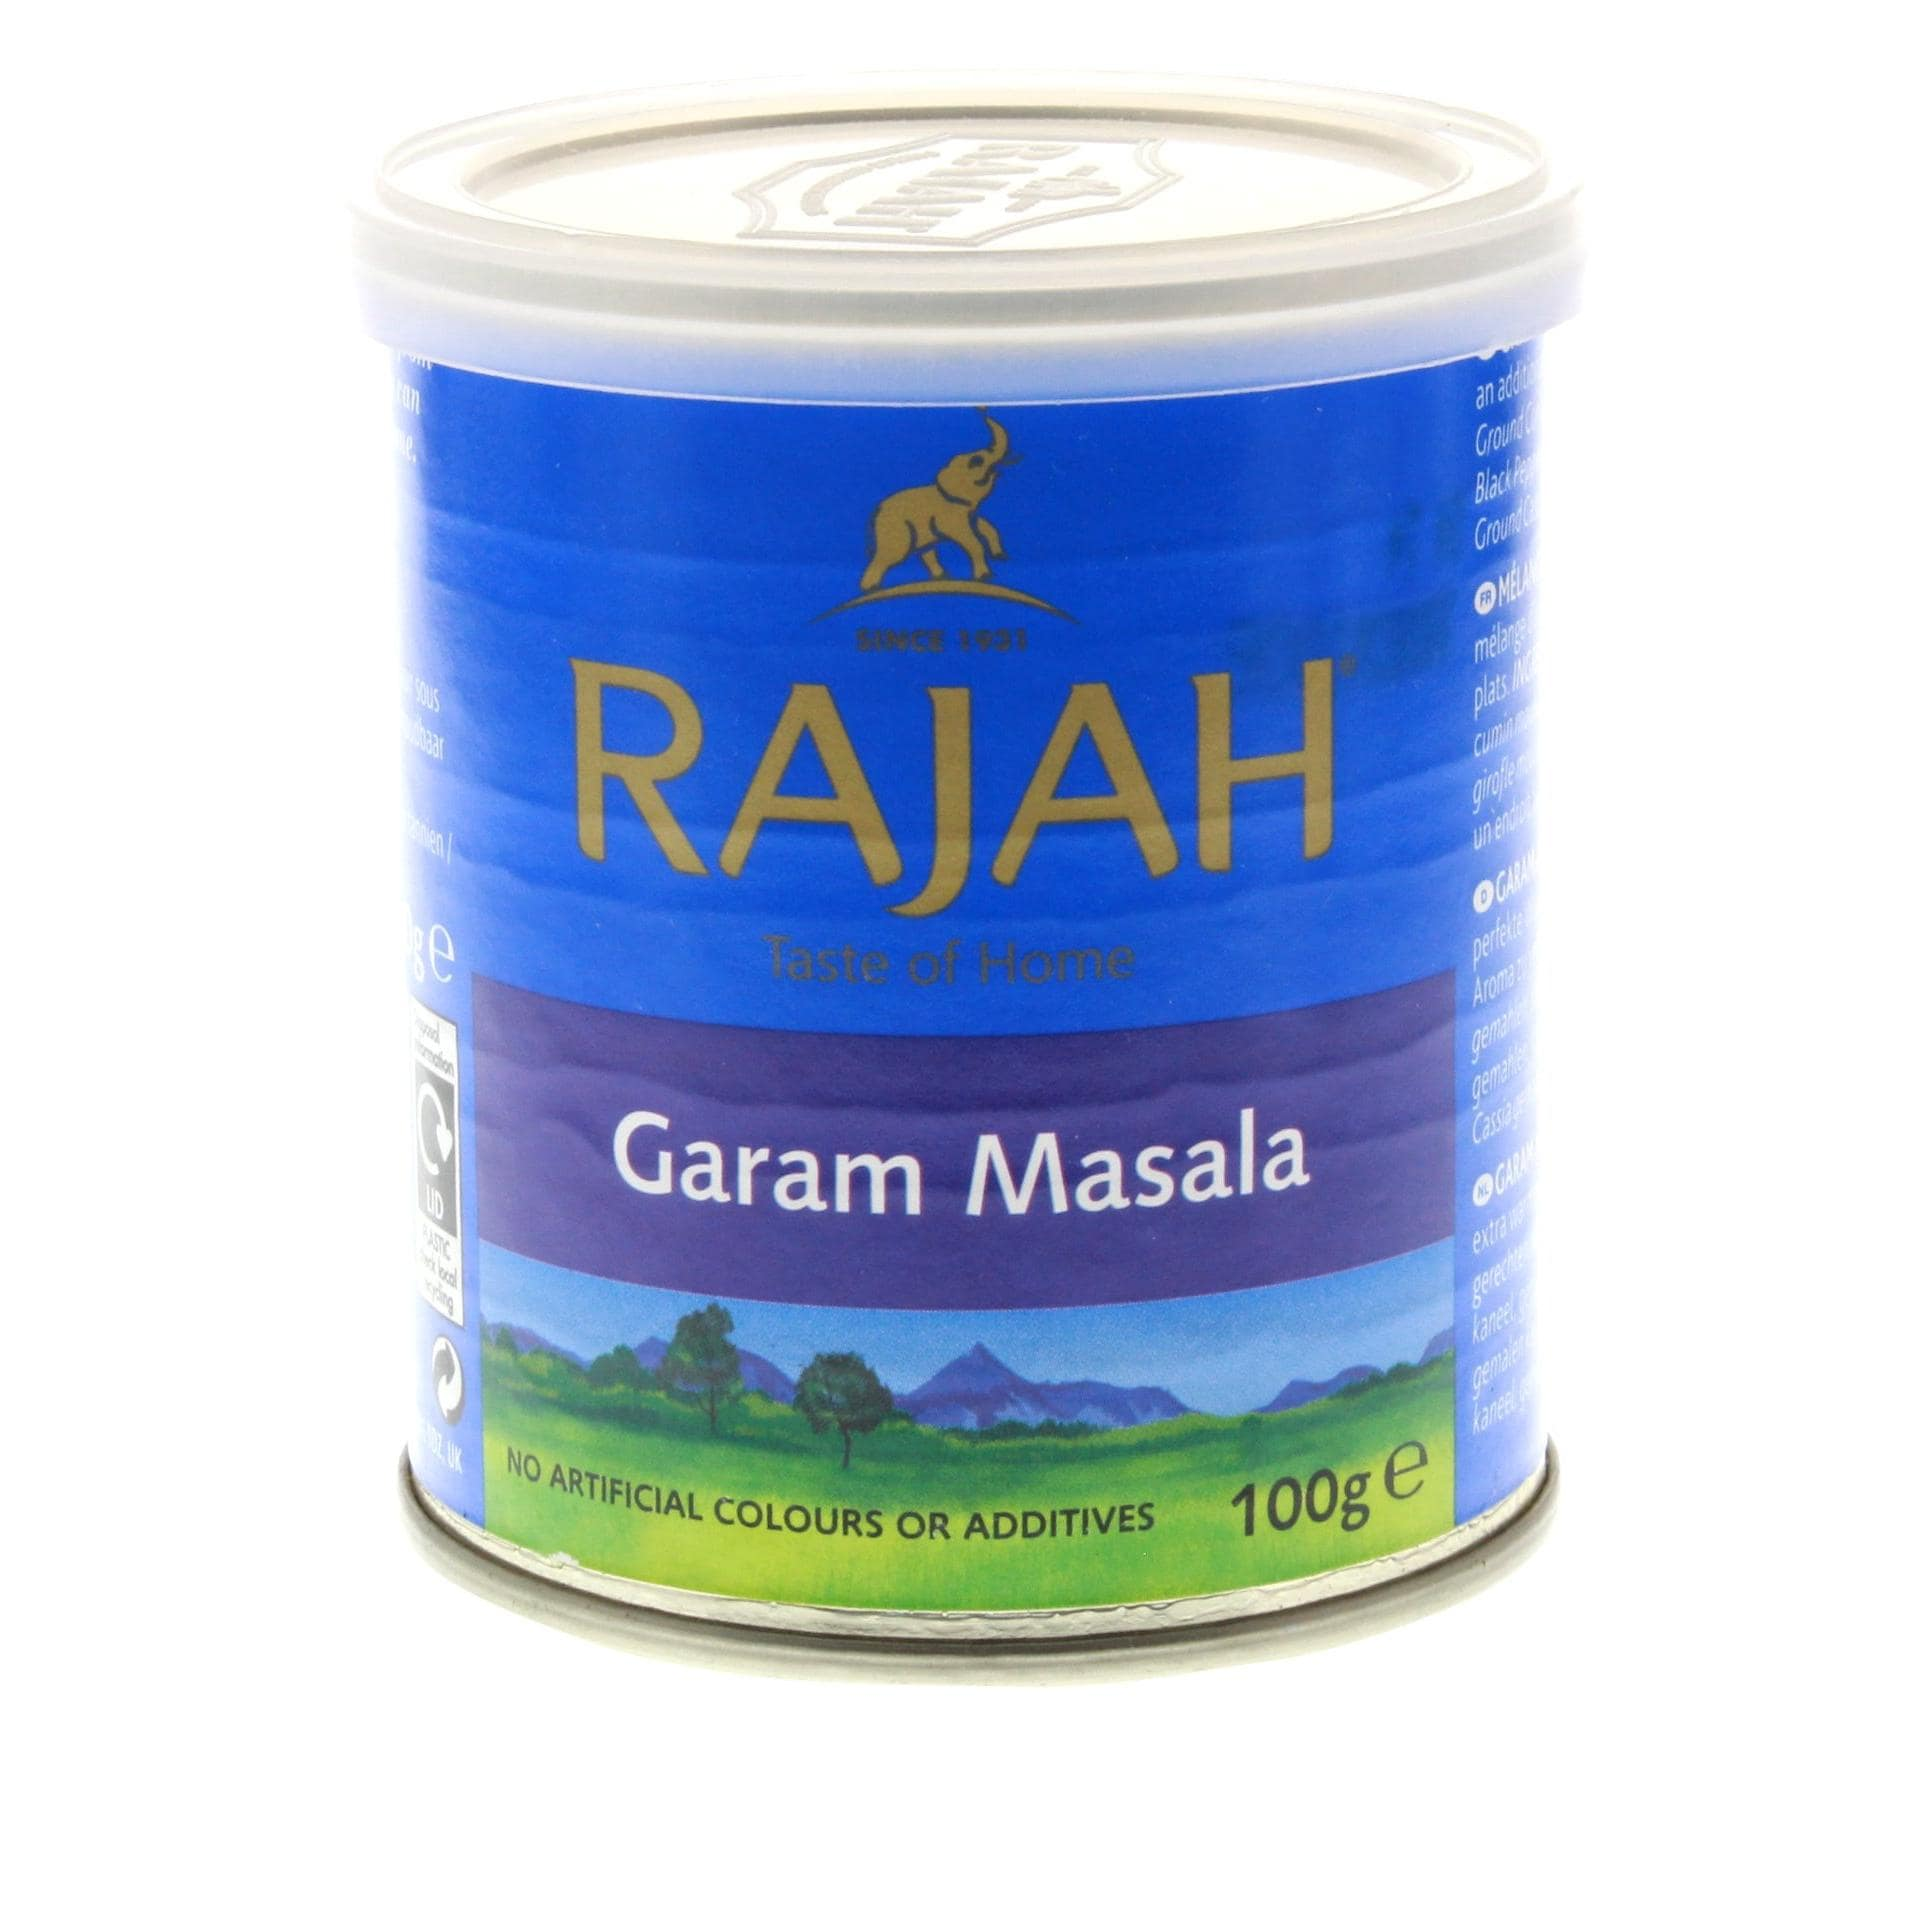 Rajah - Garam Masala Gewürzmischung - 100g